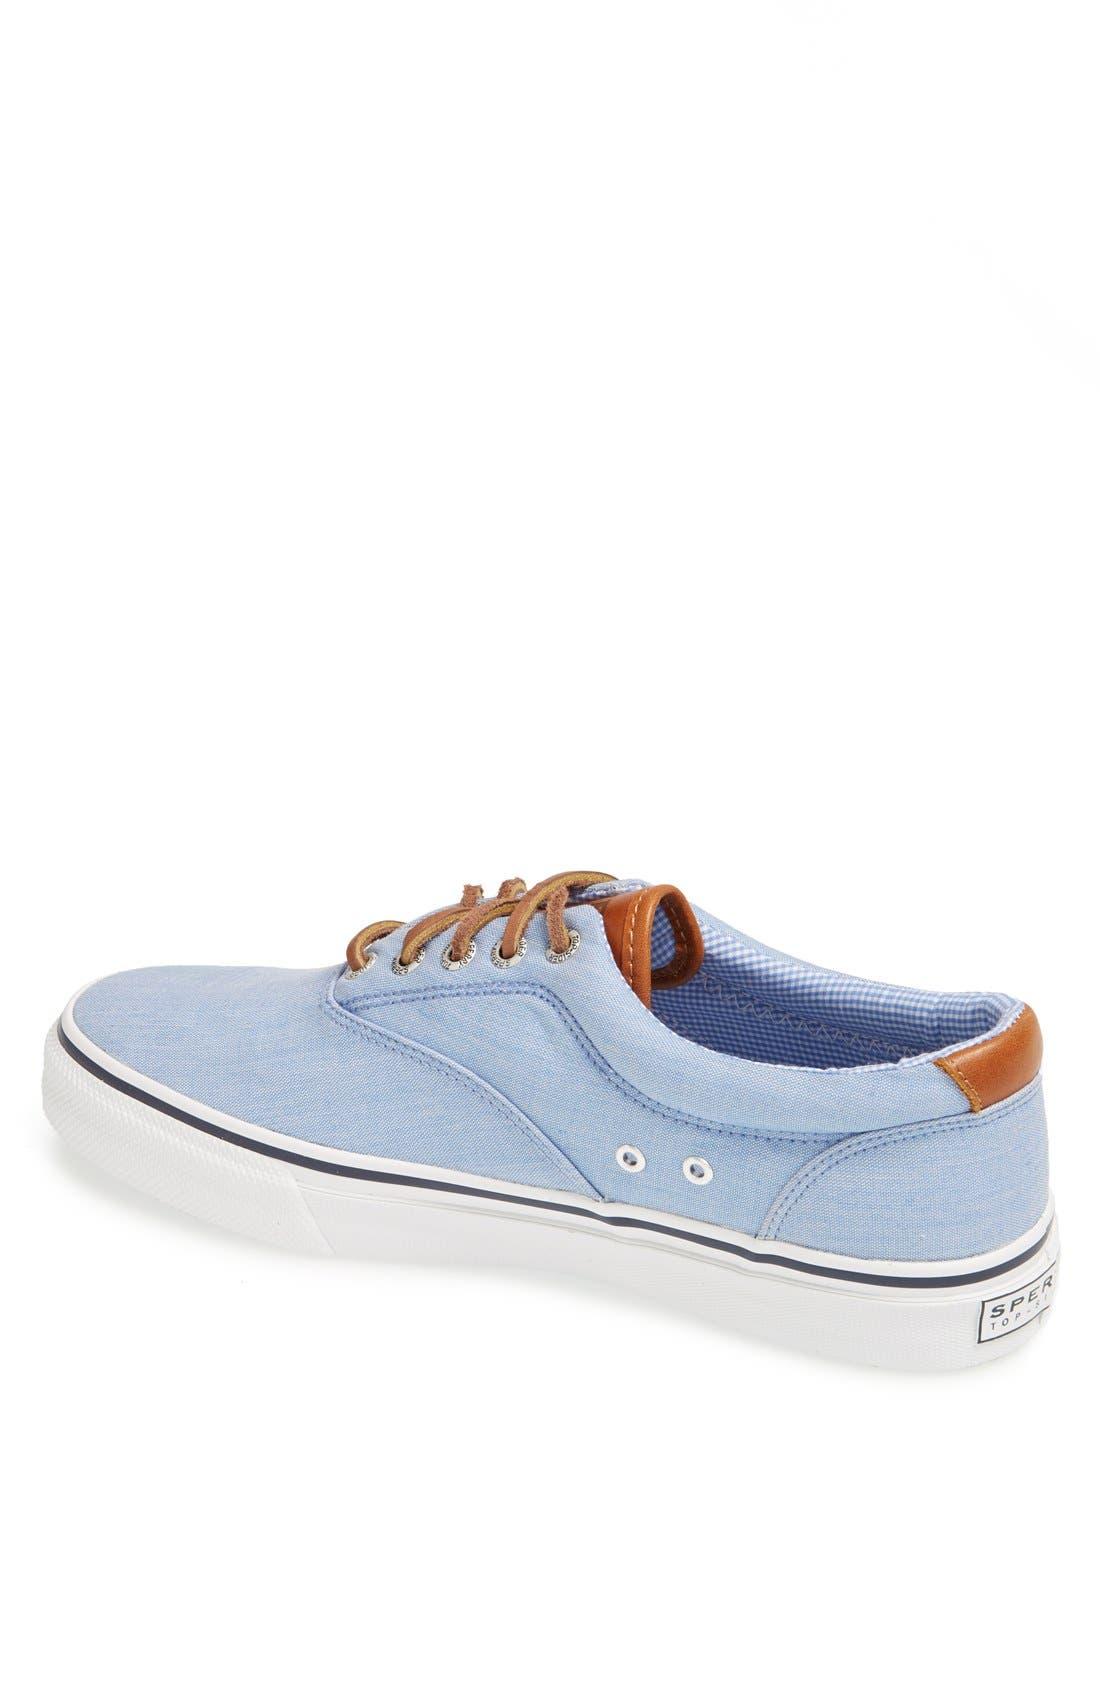 Alternate Image 2  - Sperry Top-Sider® 'CVO' Chambray Sneaker (Men)